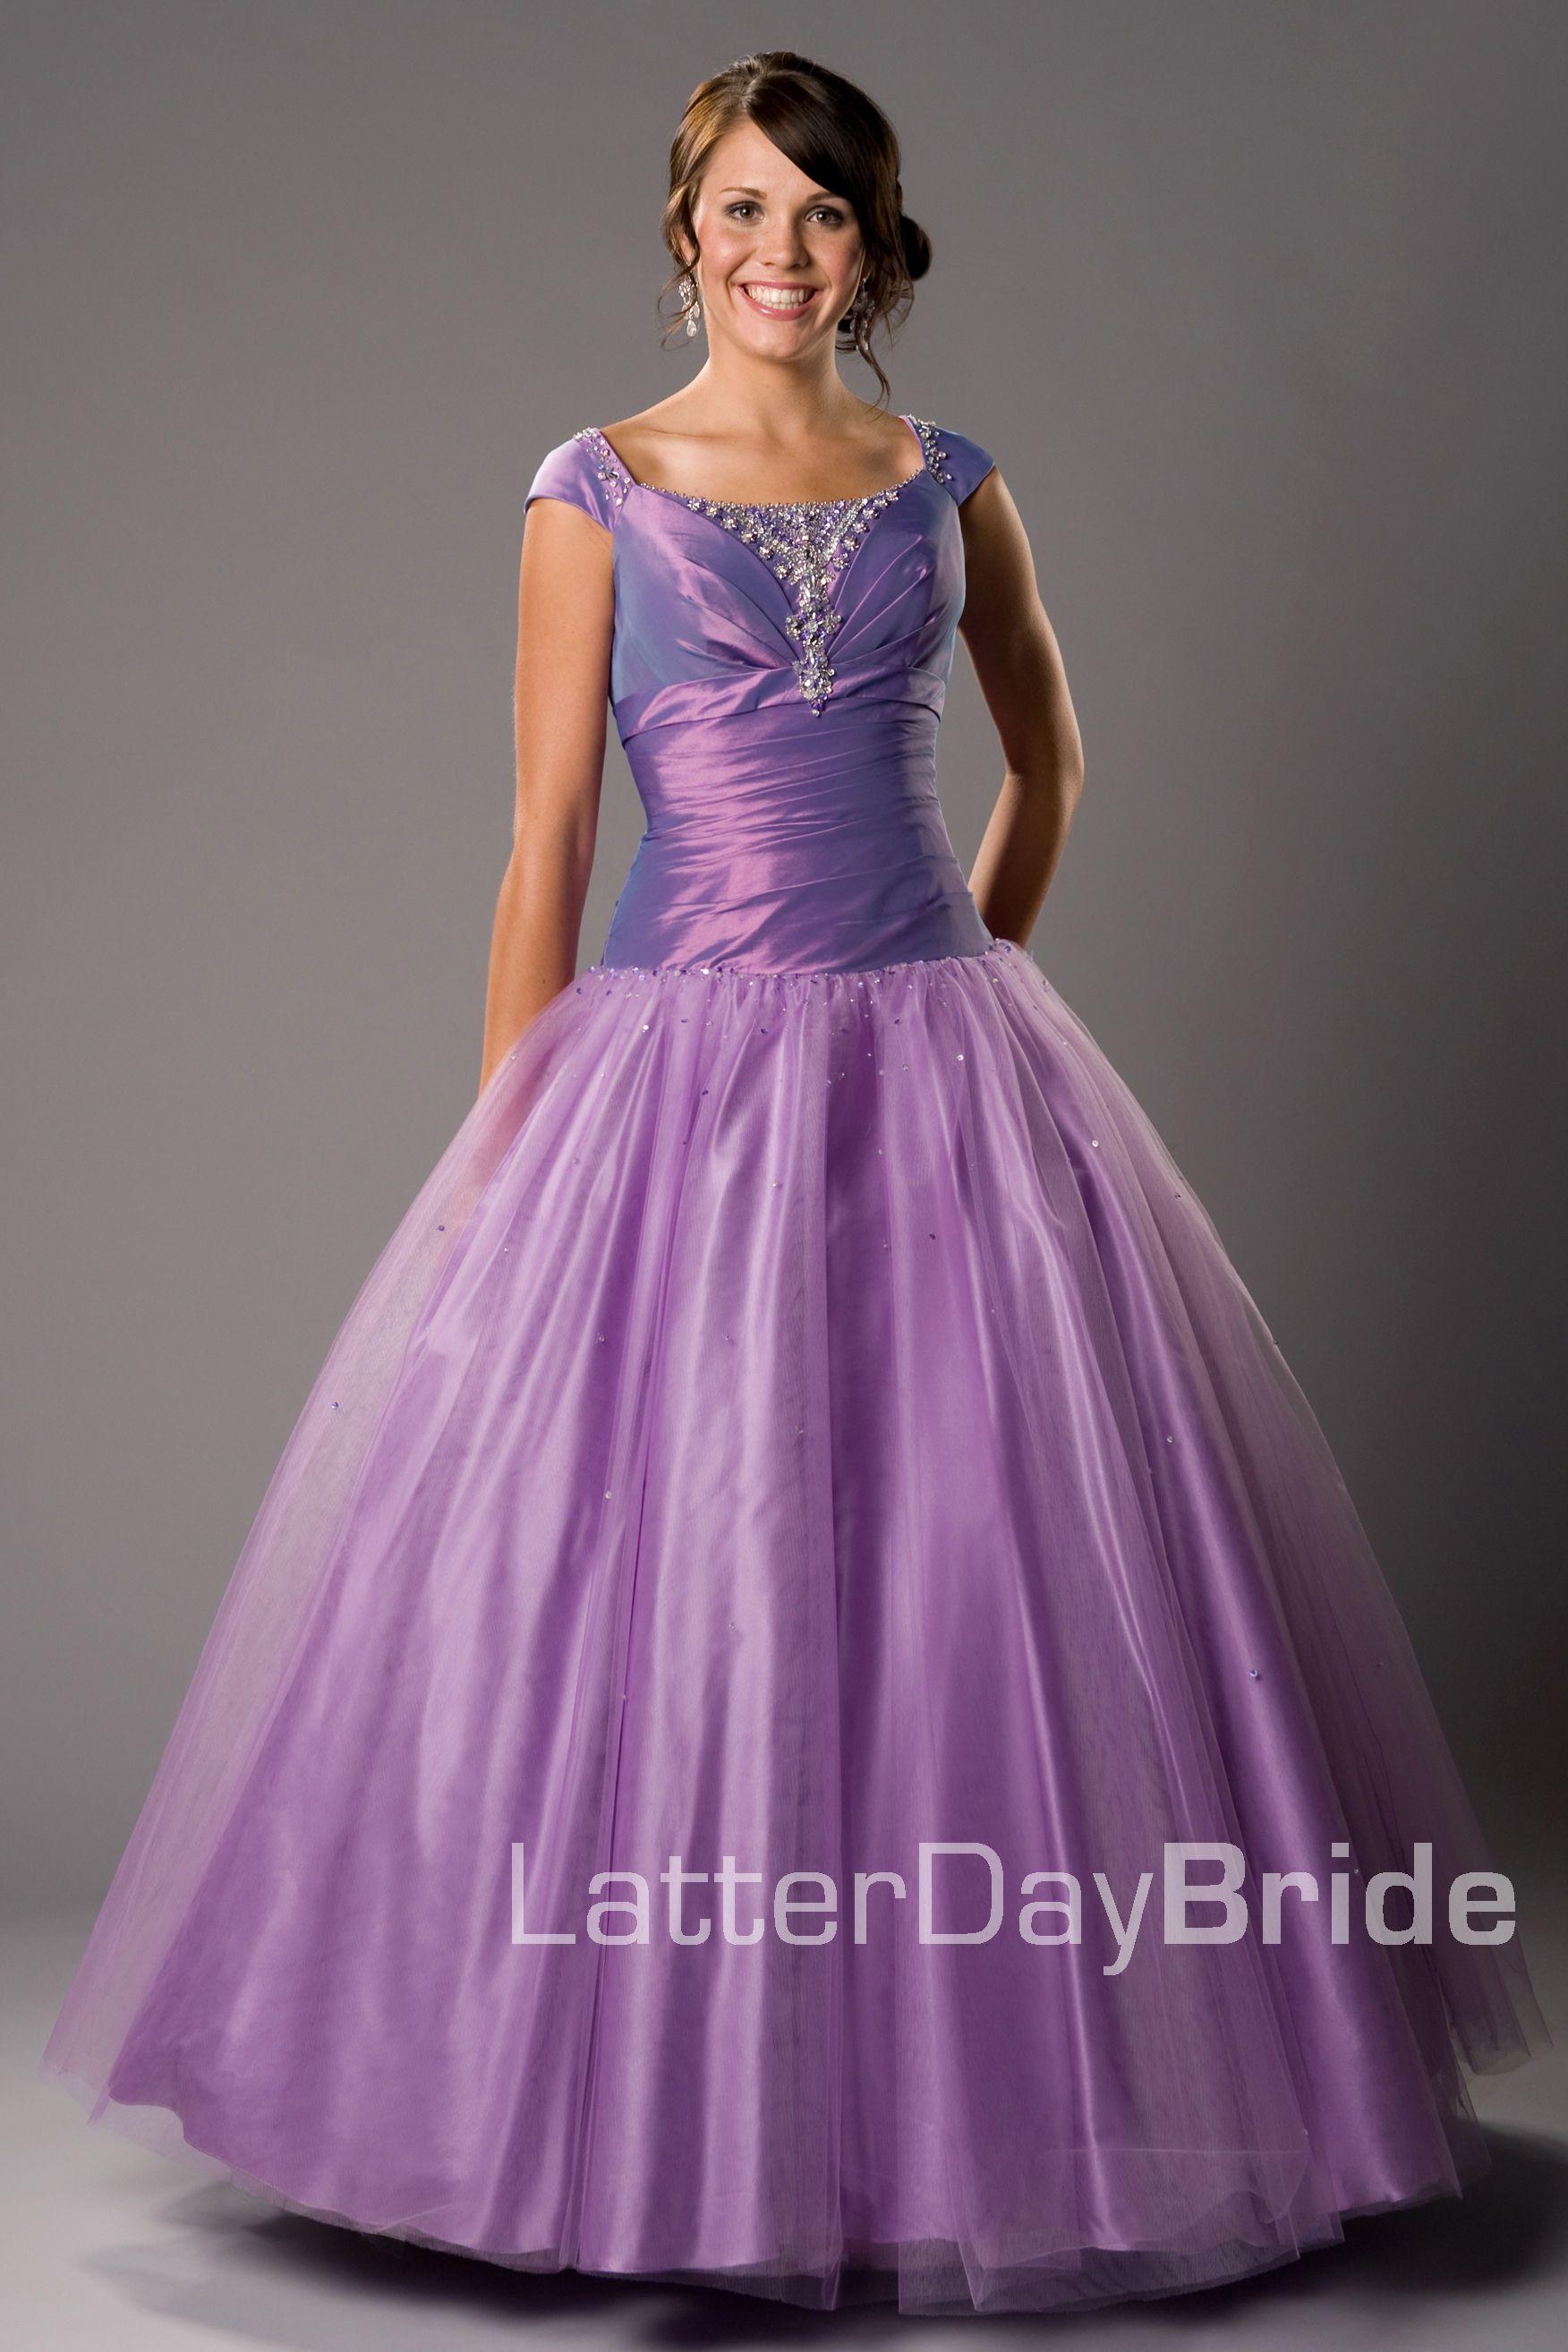 Bridesmaid & Prom, Lilah | LatterDayBride & Prom | Lizz\'s Prom 2015 ...